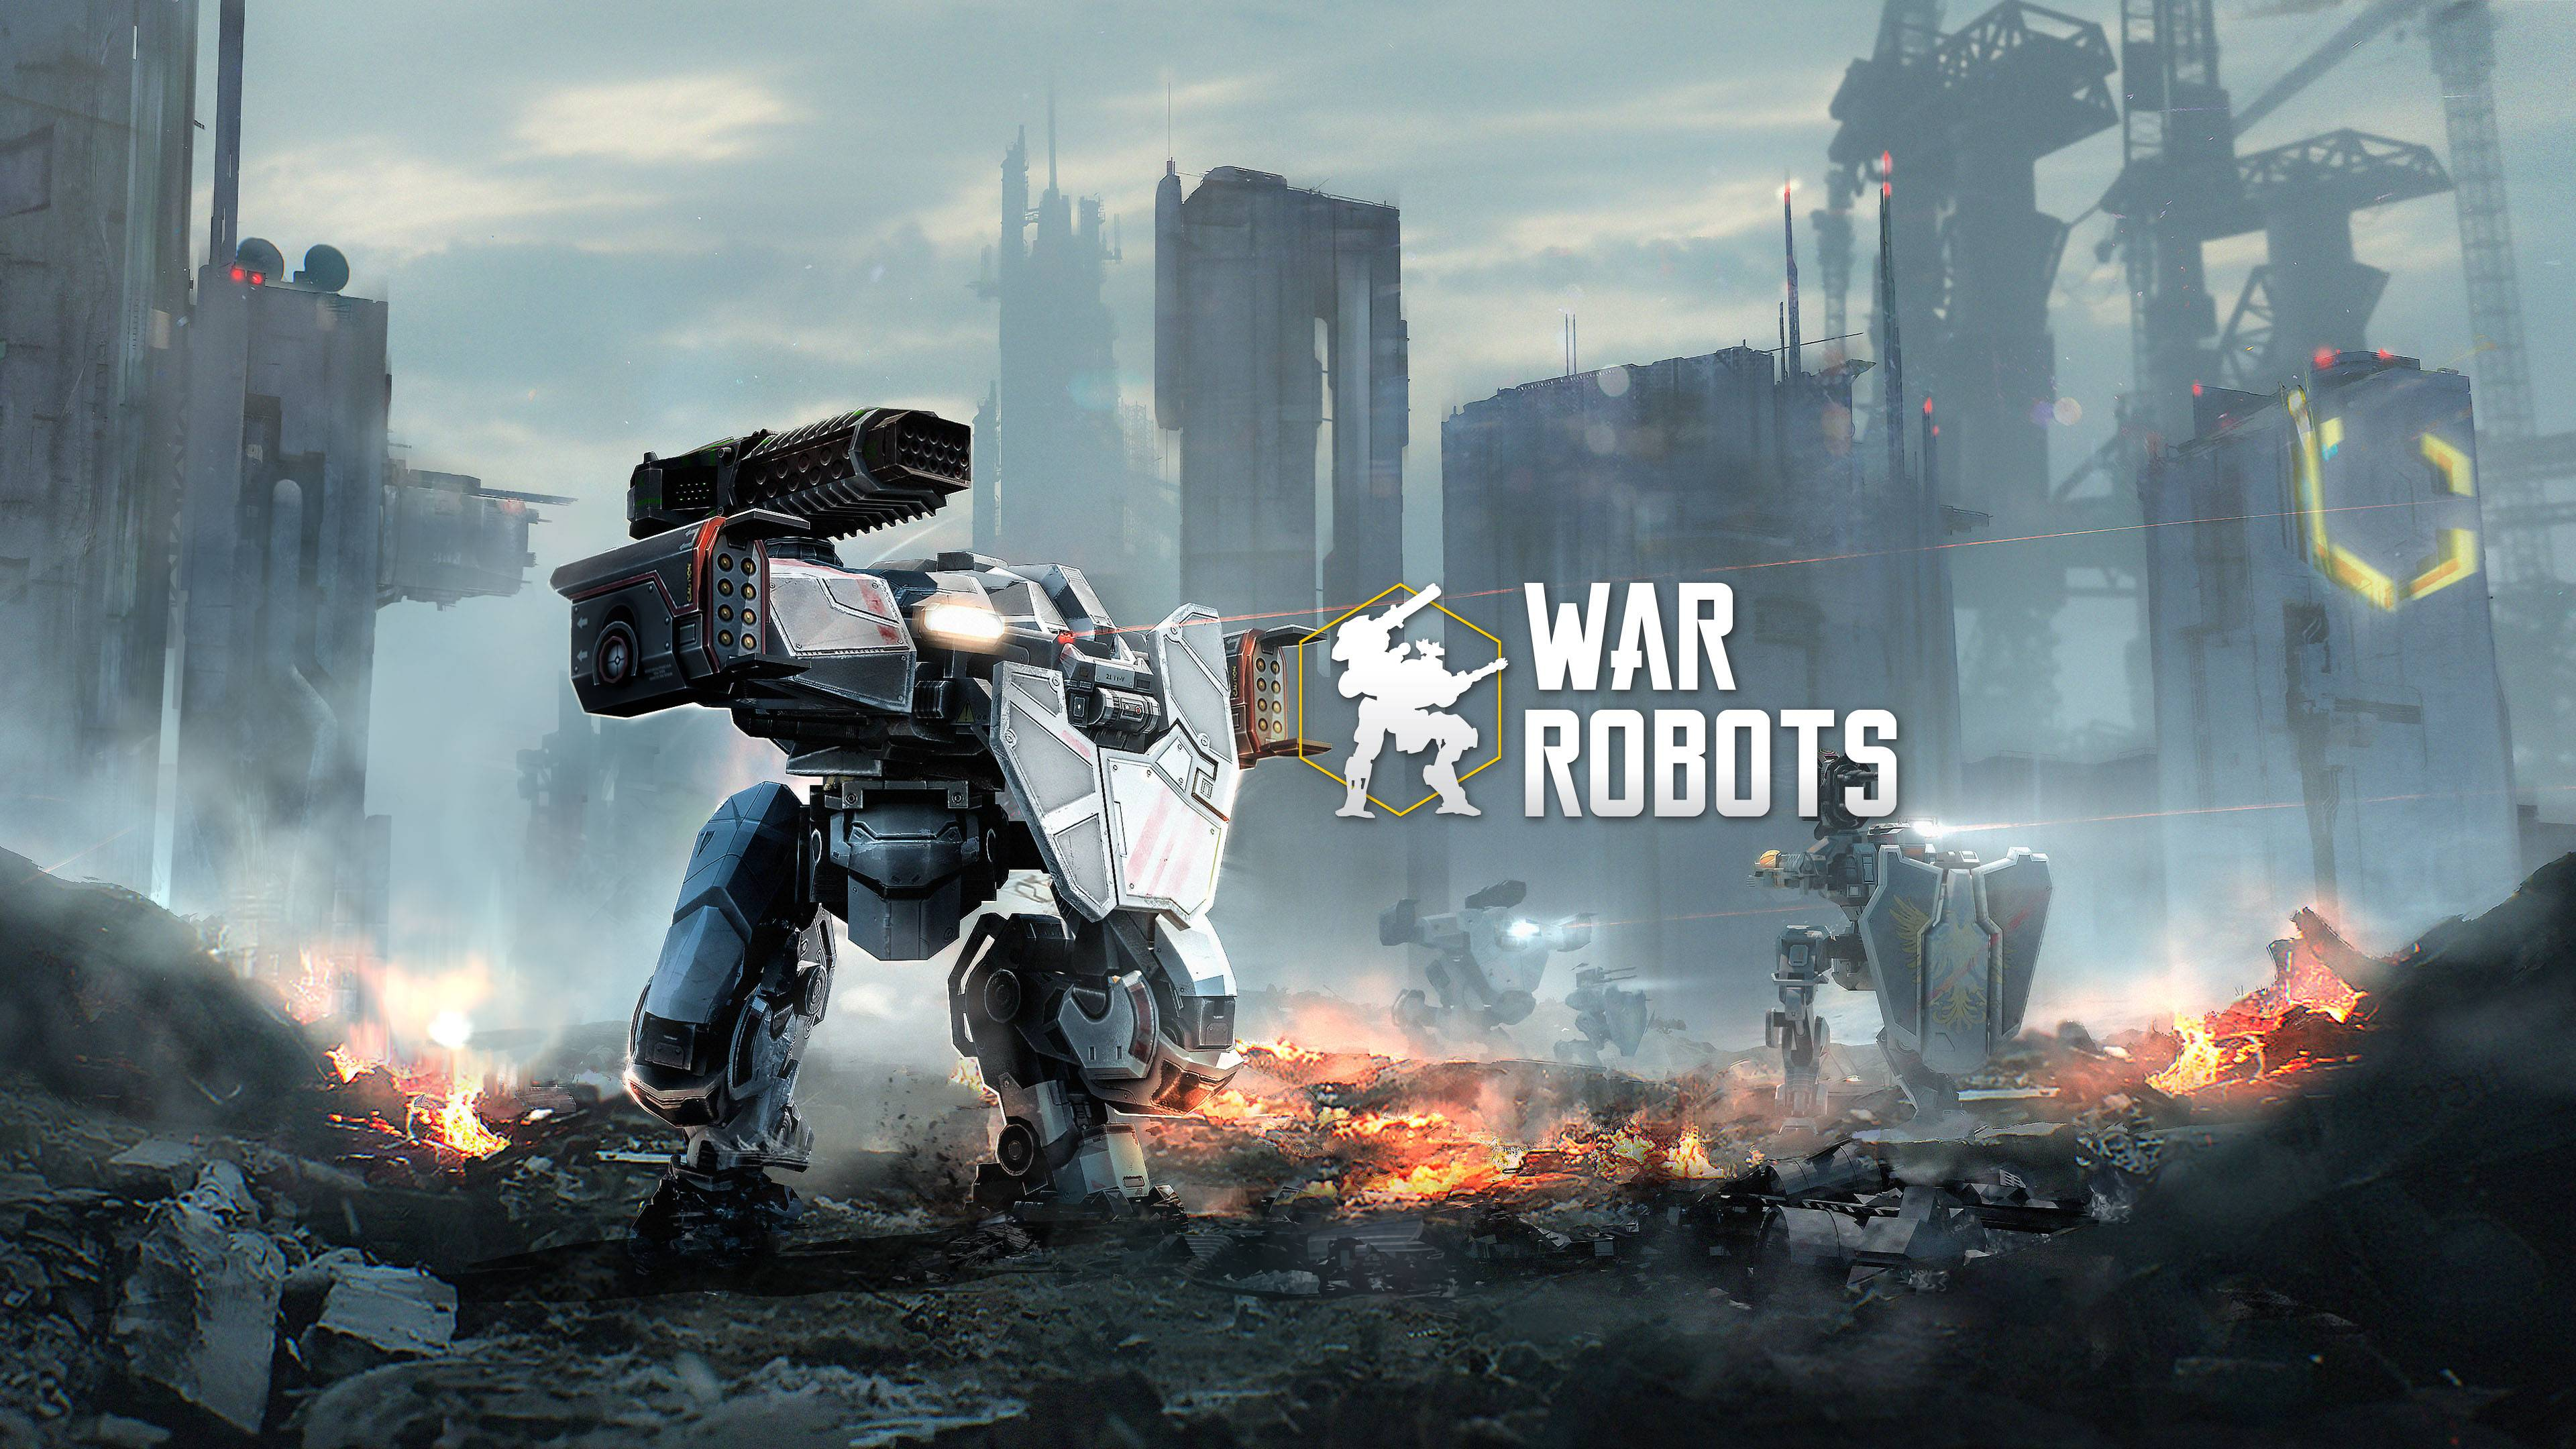 War Robots Wallpapers On Wallpaperdog